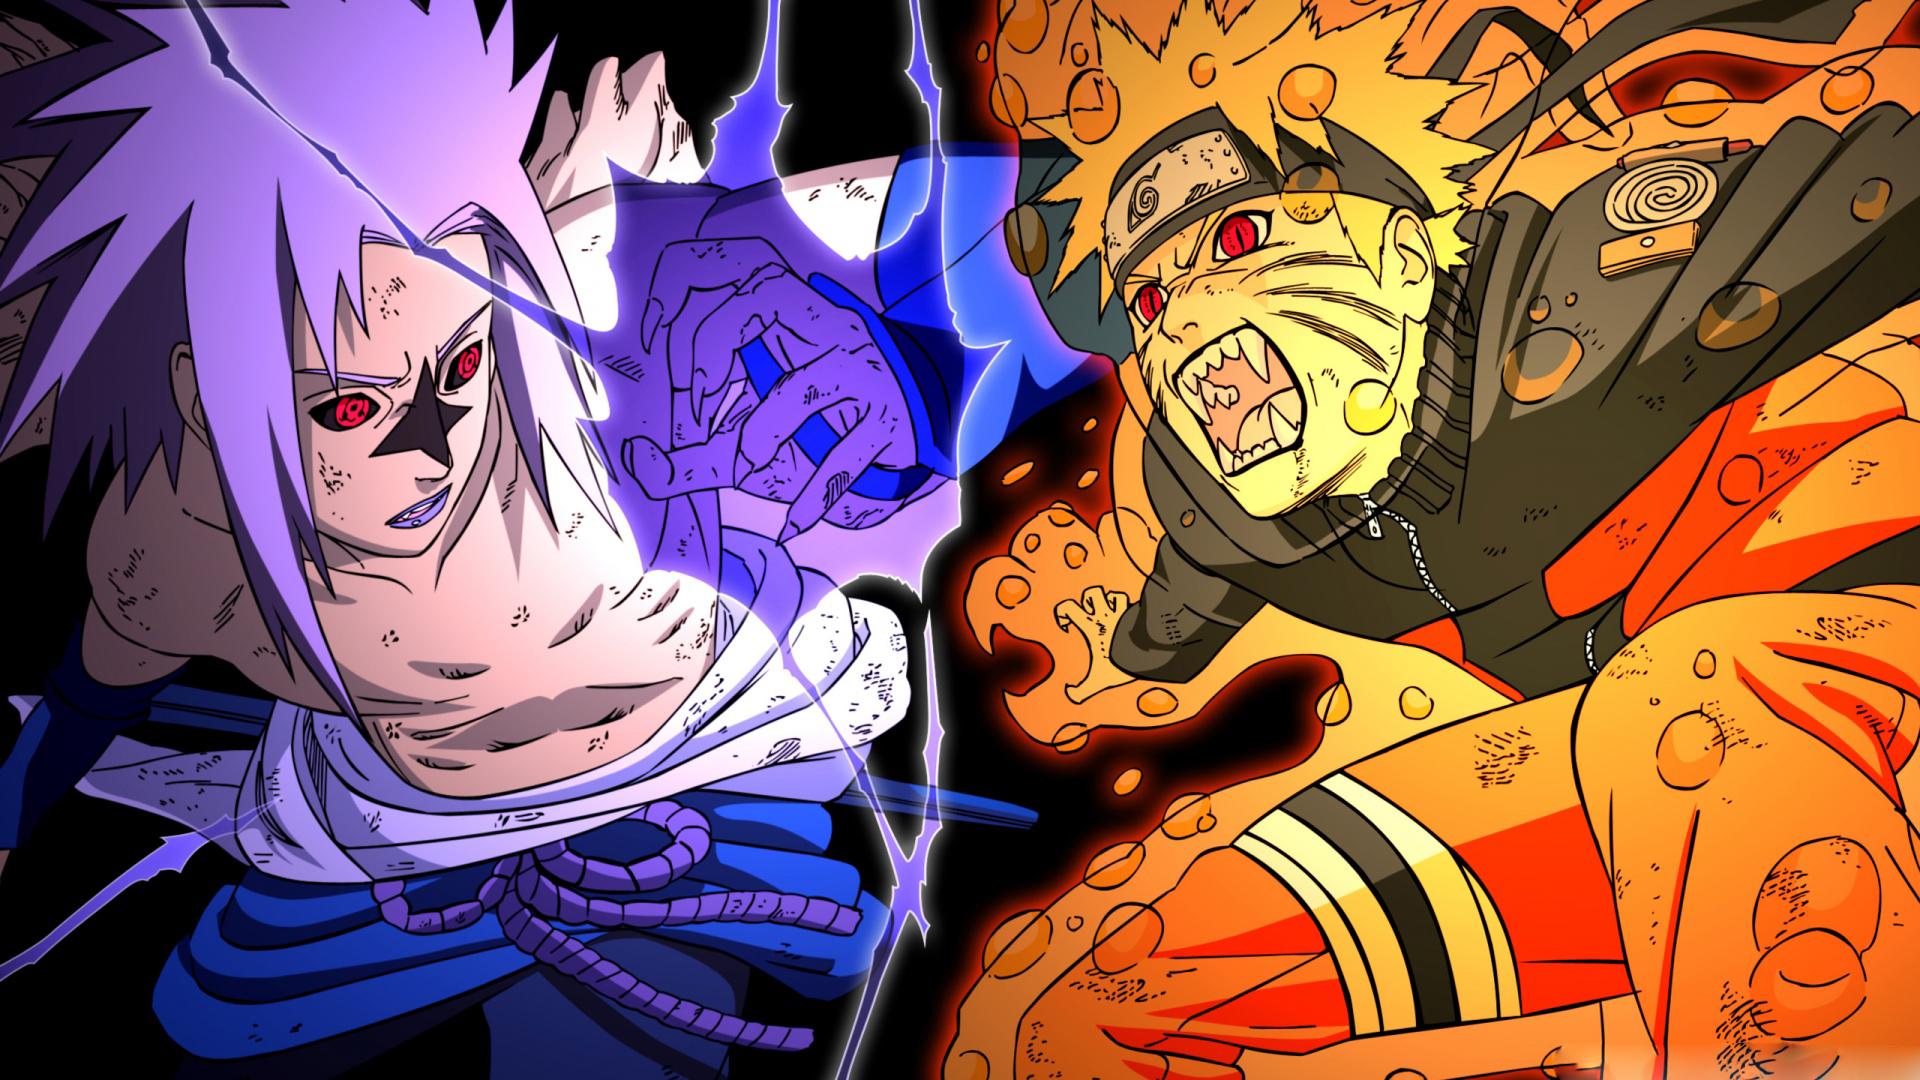 Naruto Kyubi Sasuke Versus Wallpaper #23997 Wallpaper ...